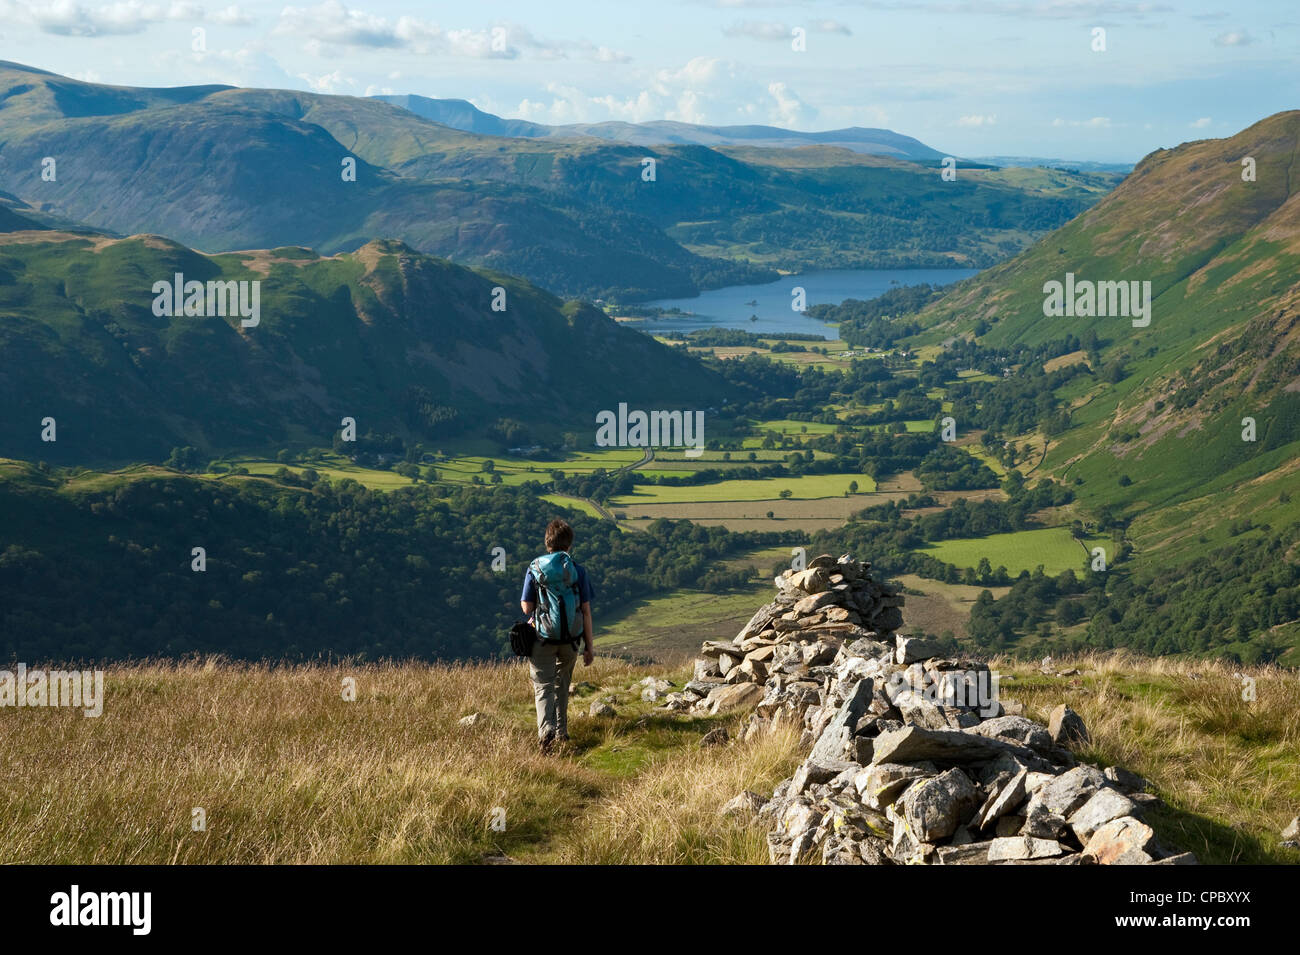 Walker descending Hartsop Dodd, overlooking Patterdale and Ullswater, Lake District - Stock Image